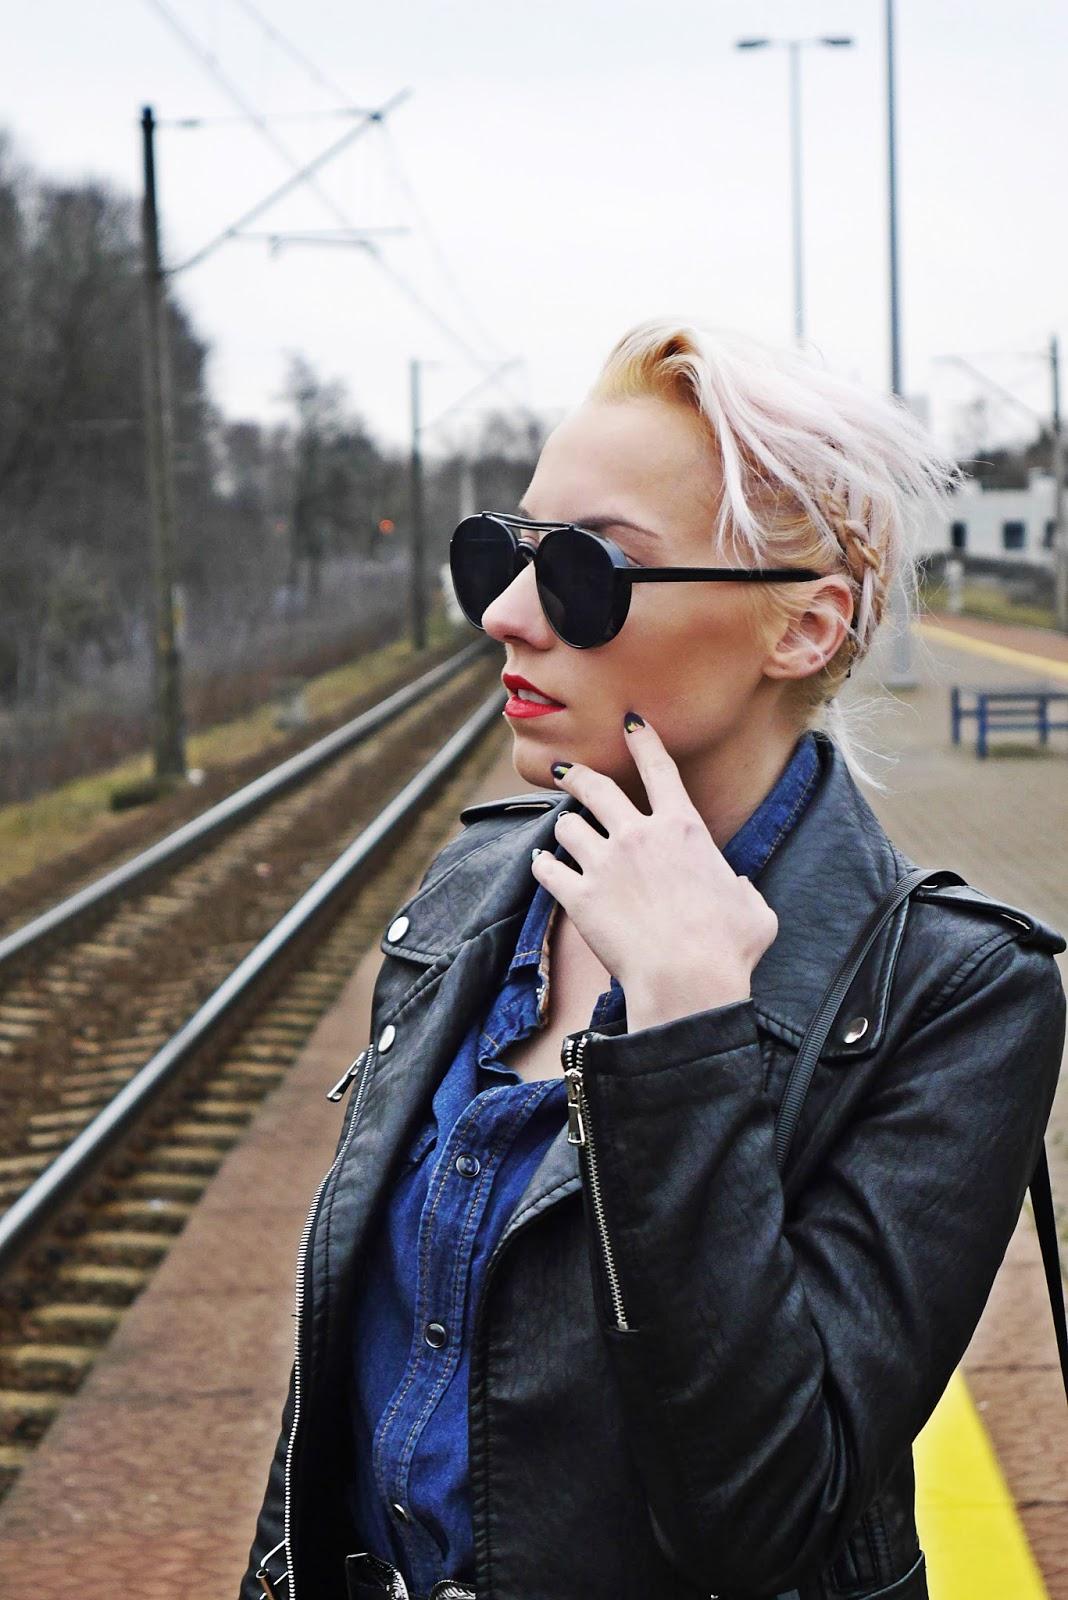 jeansowa_koszula_czarna_ramoneska_kozaki_z_kolano_karyn_look_230217